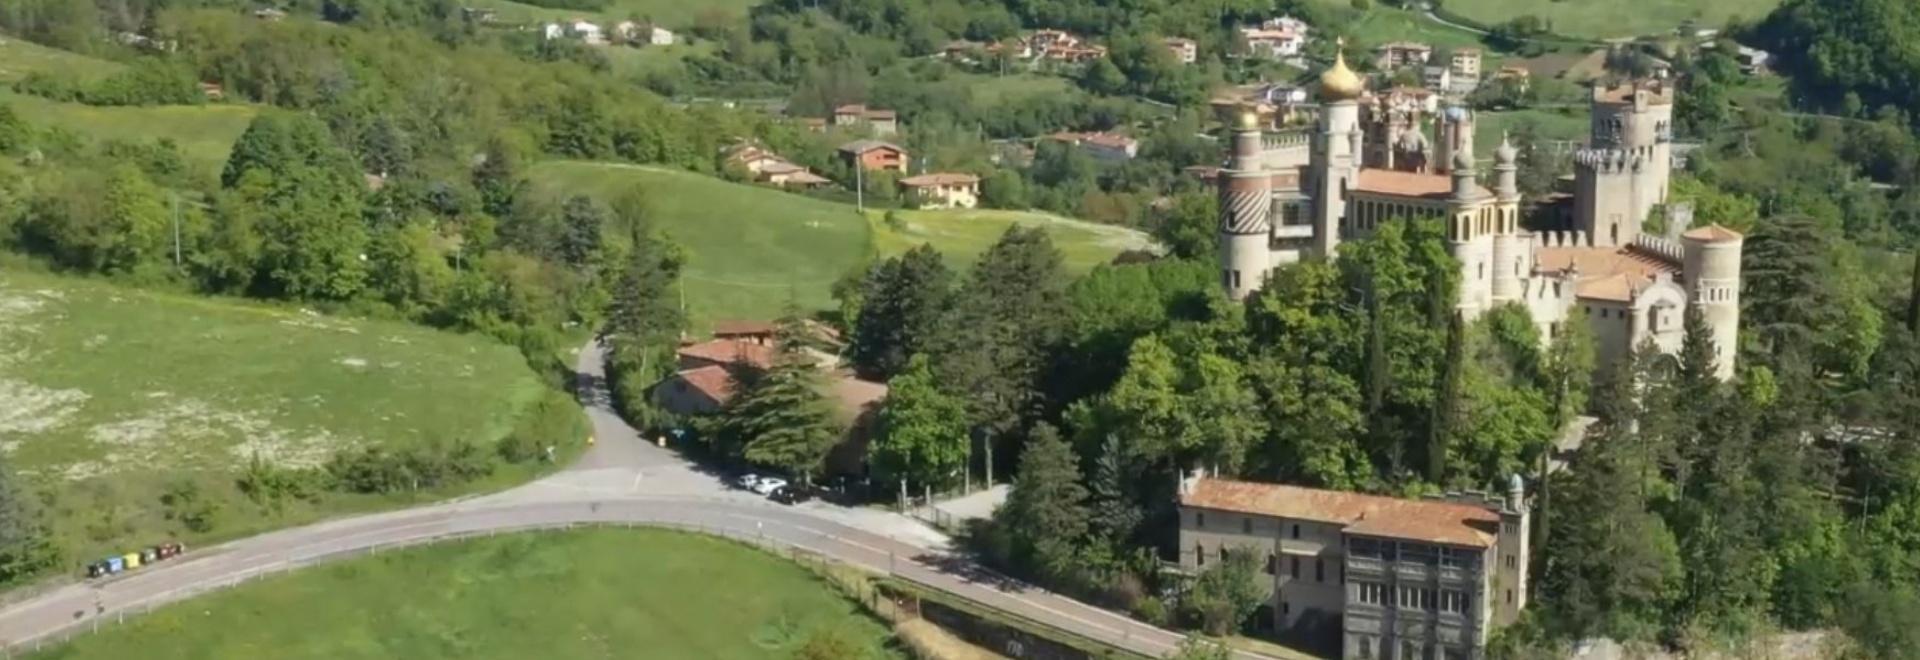 La via Francigena in Emilia